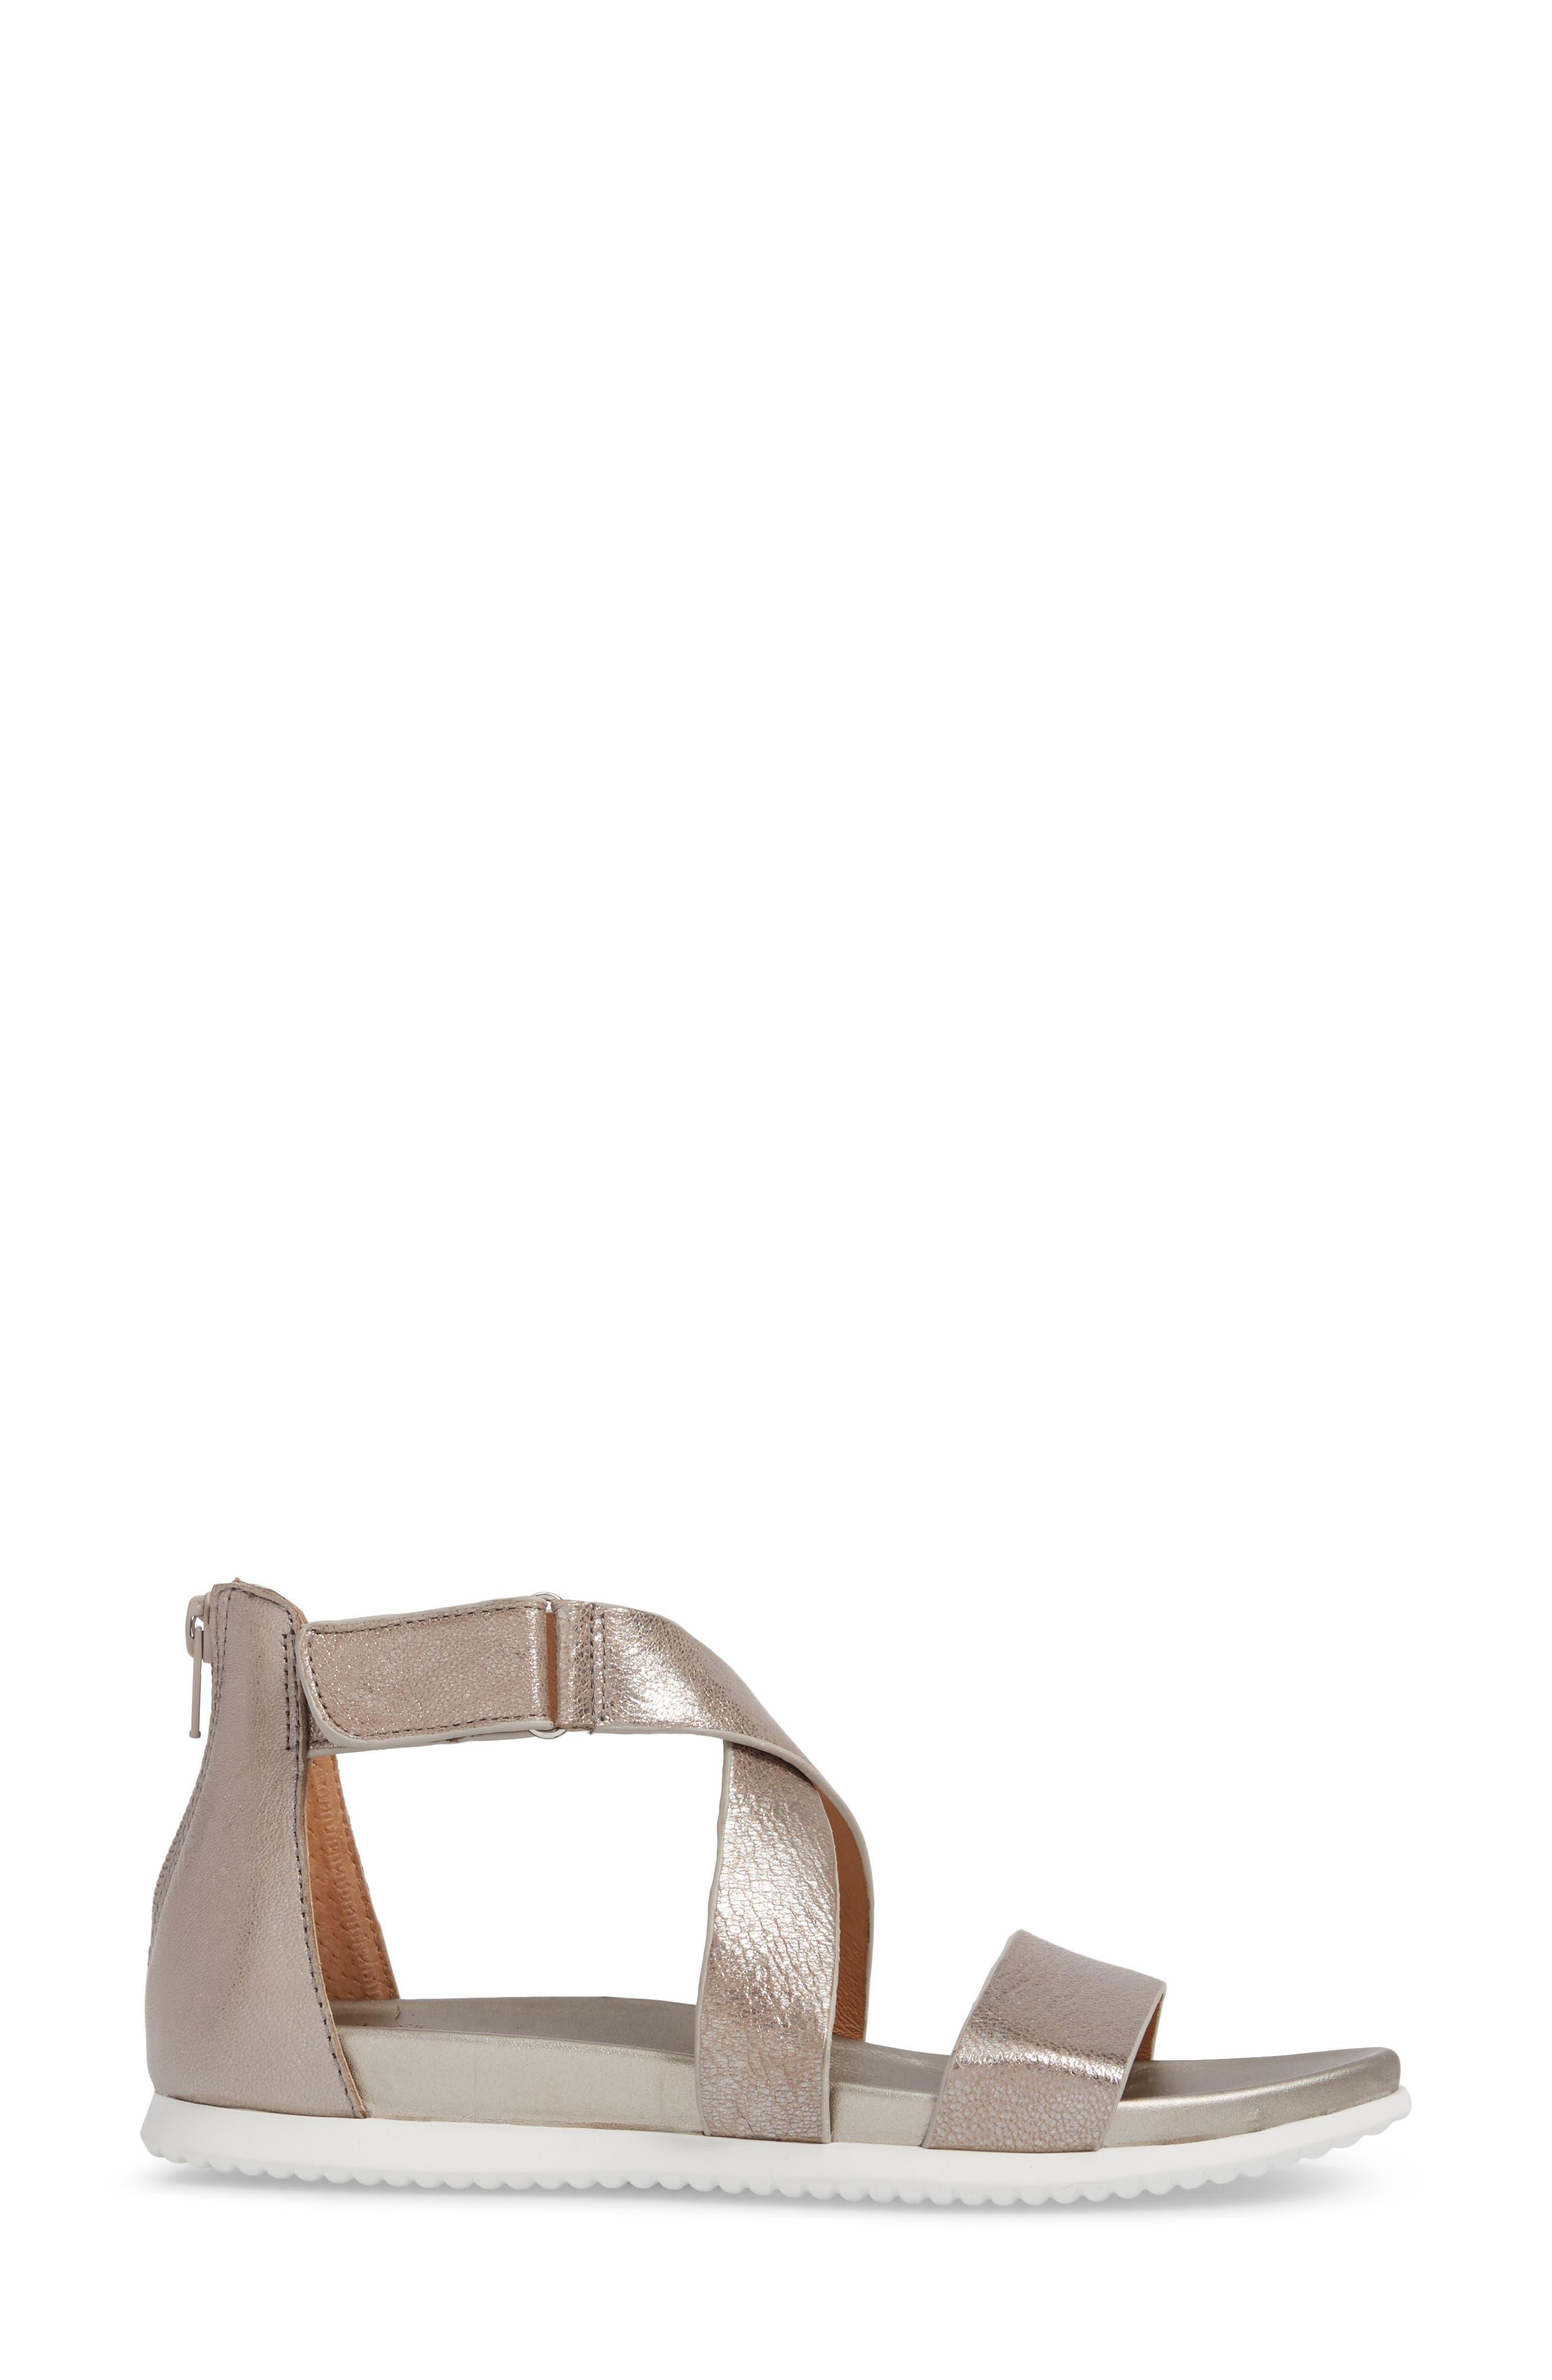 Fiora Sandal,                             Alternate thumbnail 3, color,                             Anthracite Leather